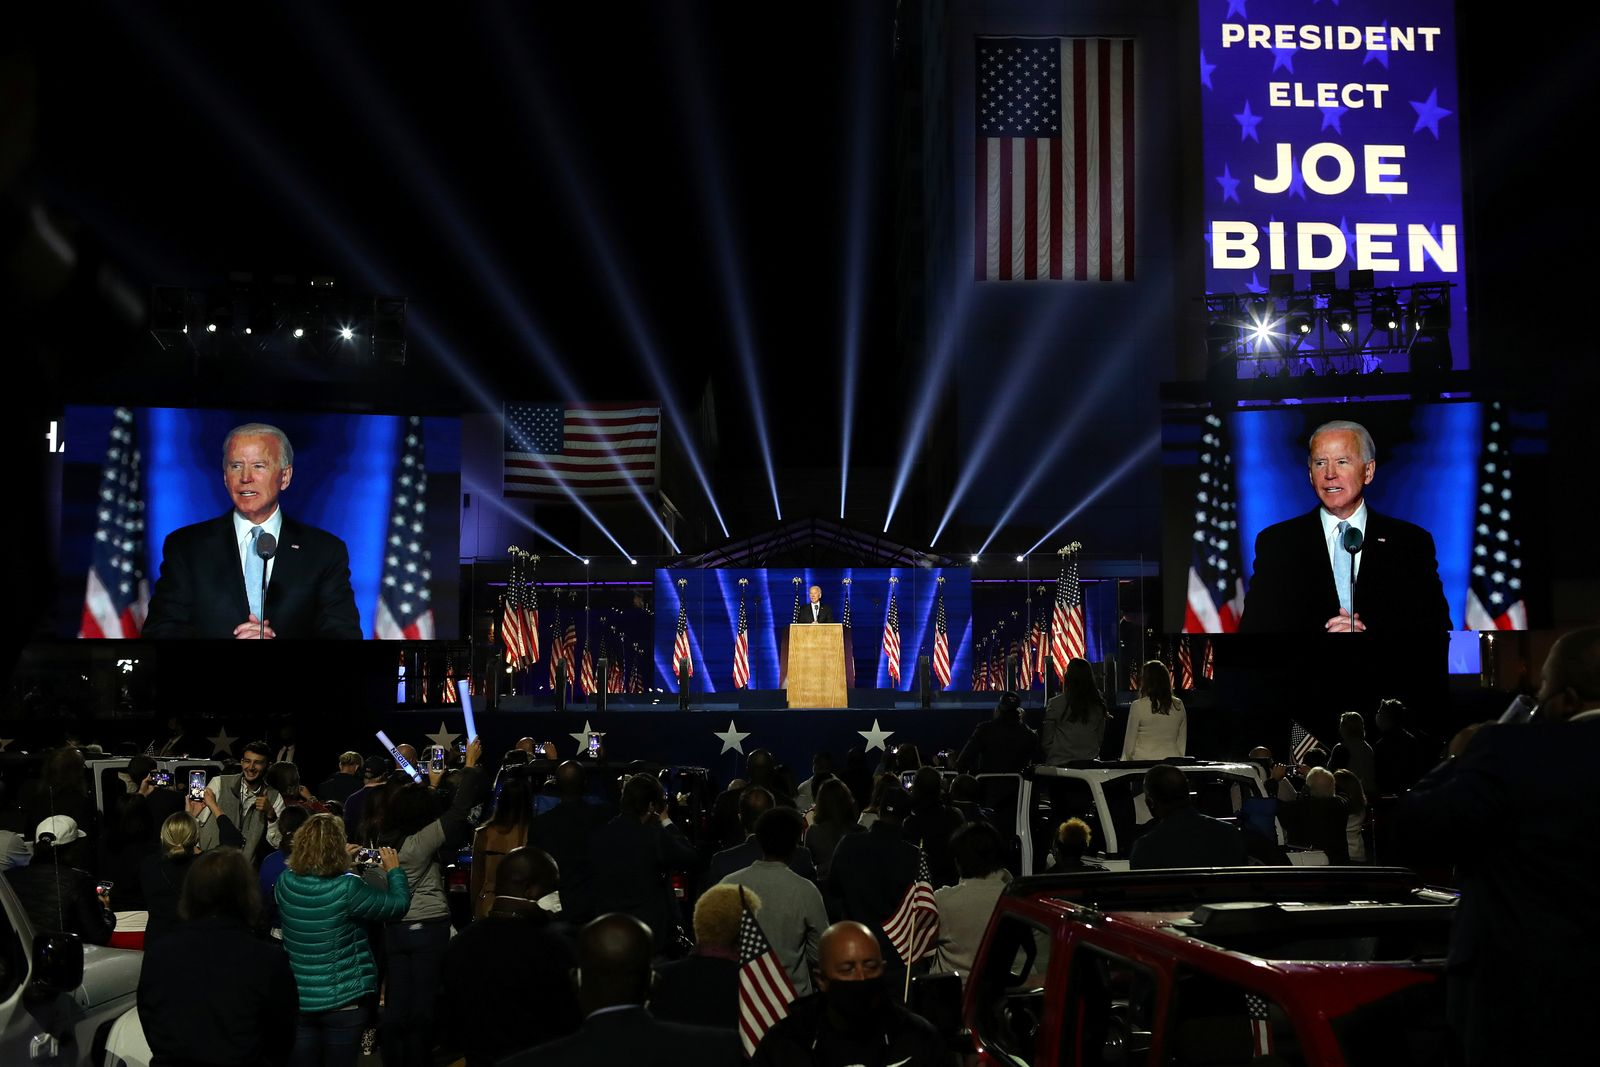 Democratic 2020 U.S. presidential nominee Joe Biden's an election rally, after news media announced that Biden has won the 2020 U.S. presidential election, in Wilmington, Delaware